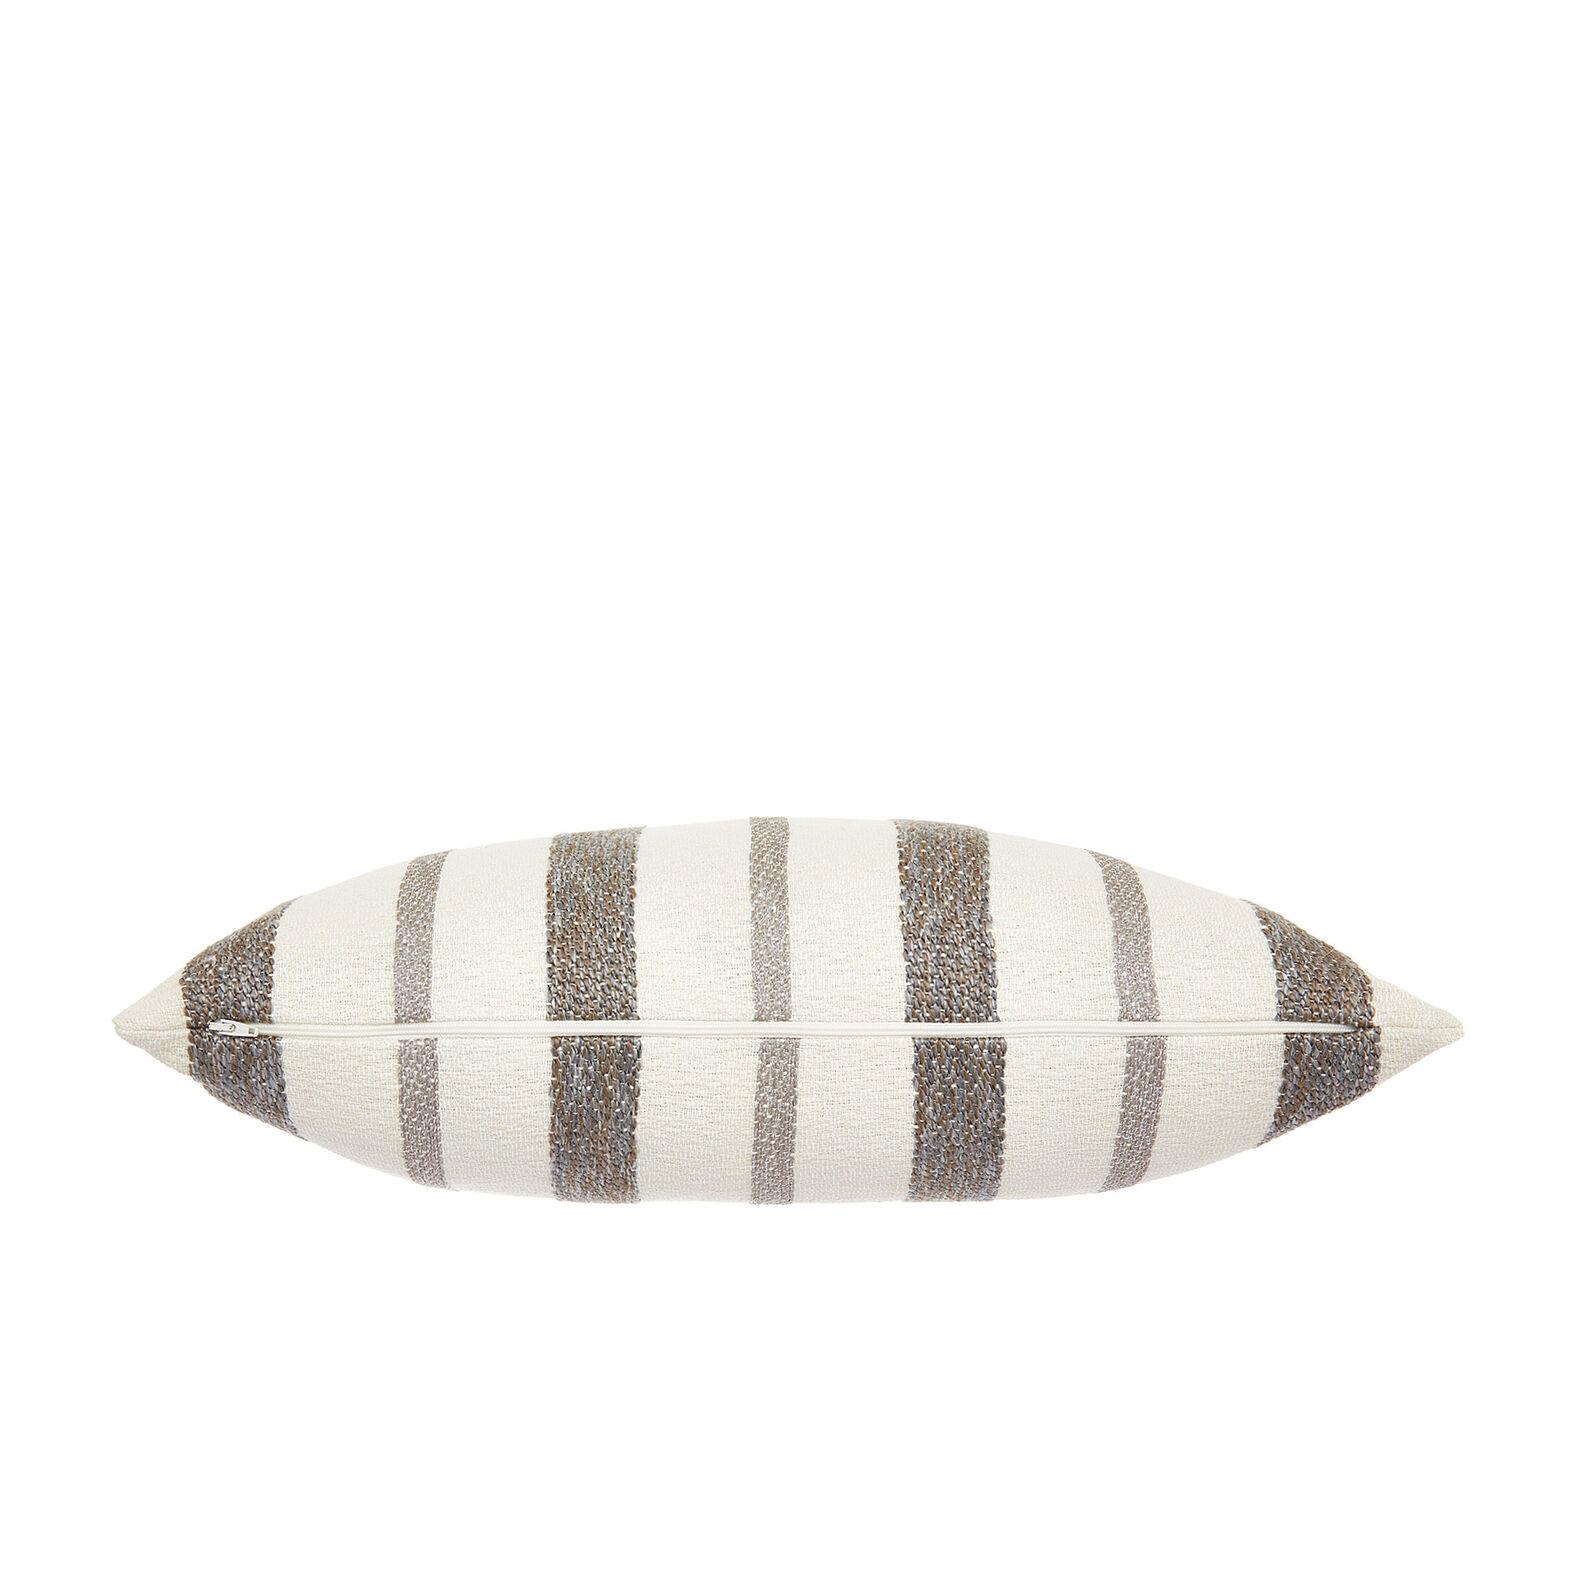 Striped cotton blend cushion 35x55cm